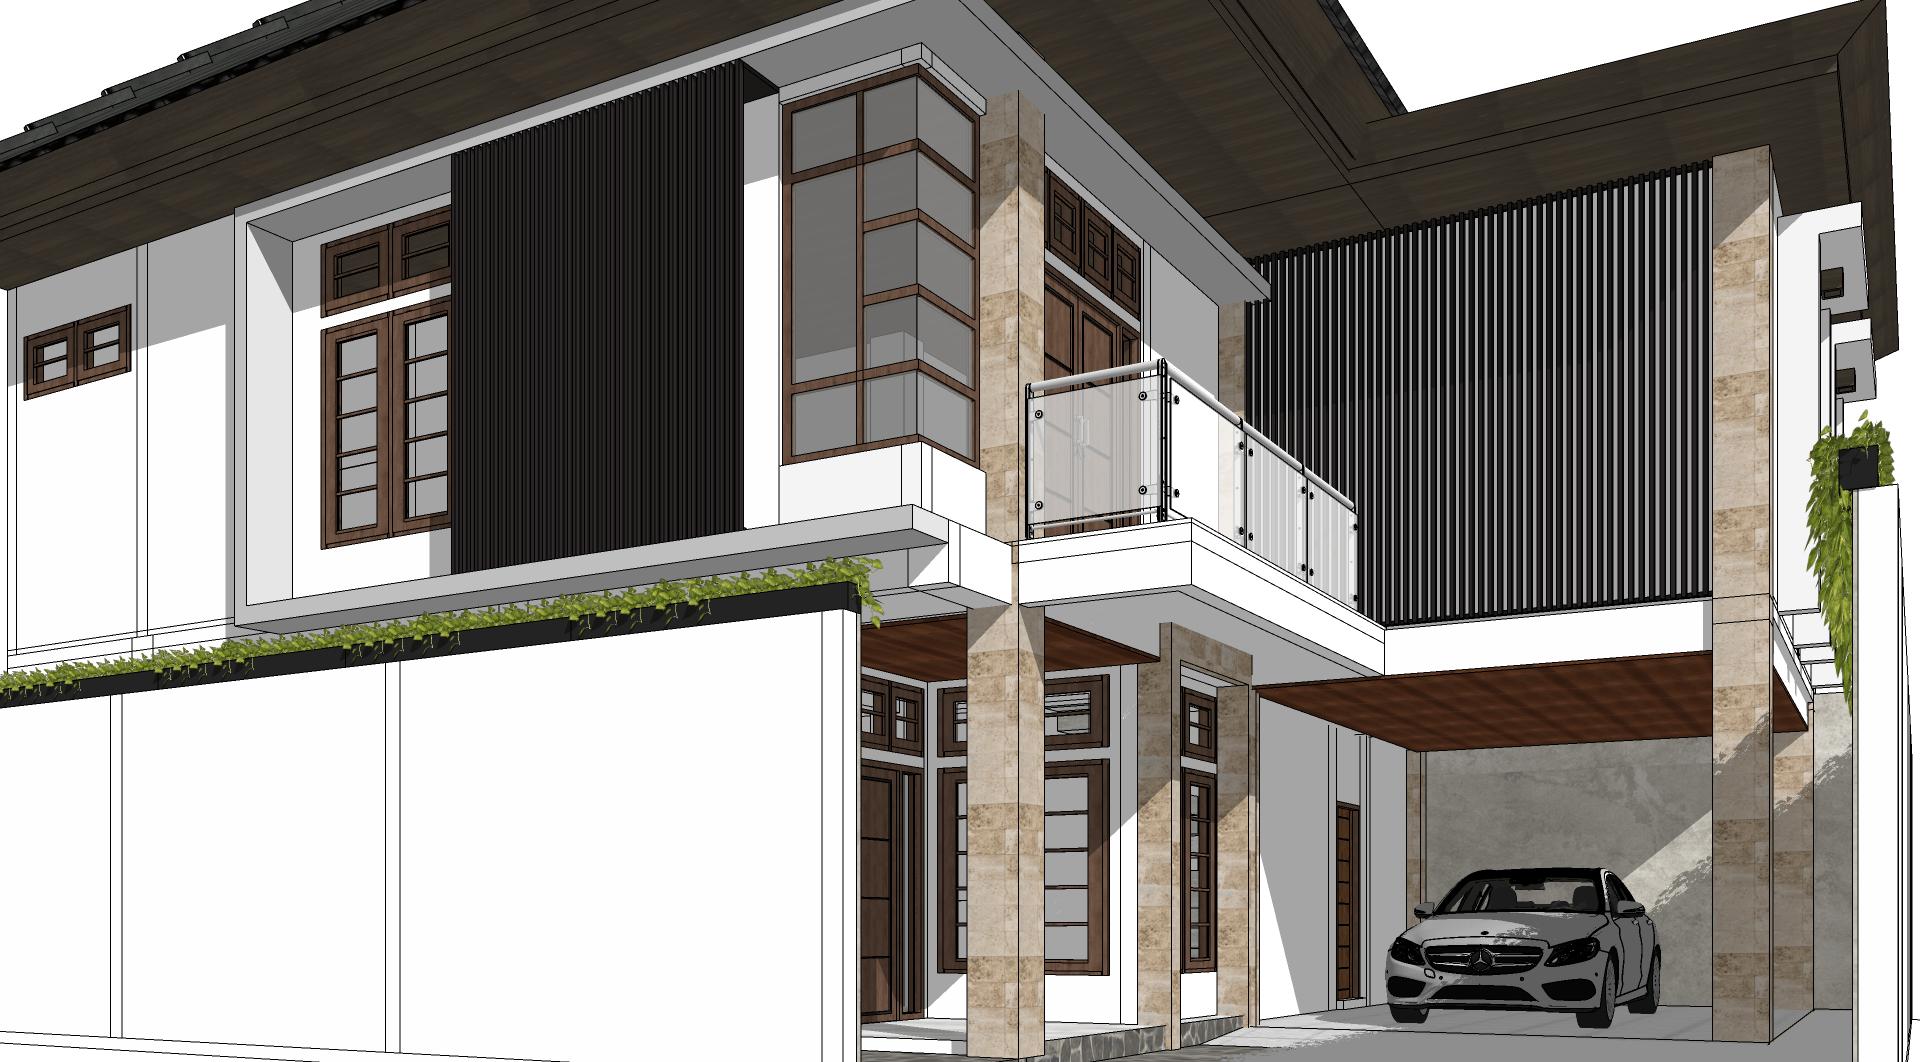 Astabumi Studio Js House Timor Leste Dili, Timor-Leste Pati, Kec. Pati, Kabupaten Pati, Jawa Tengah, Indonesia Cv-Astabumi-Manunggal-Prakarsa-Js-House-Timor-Leste   119268